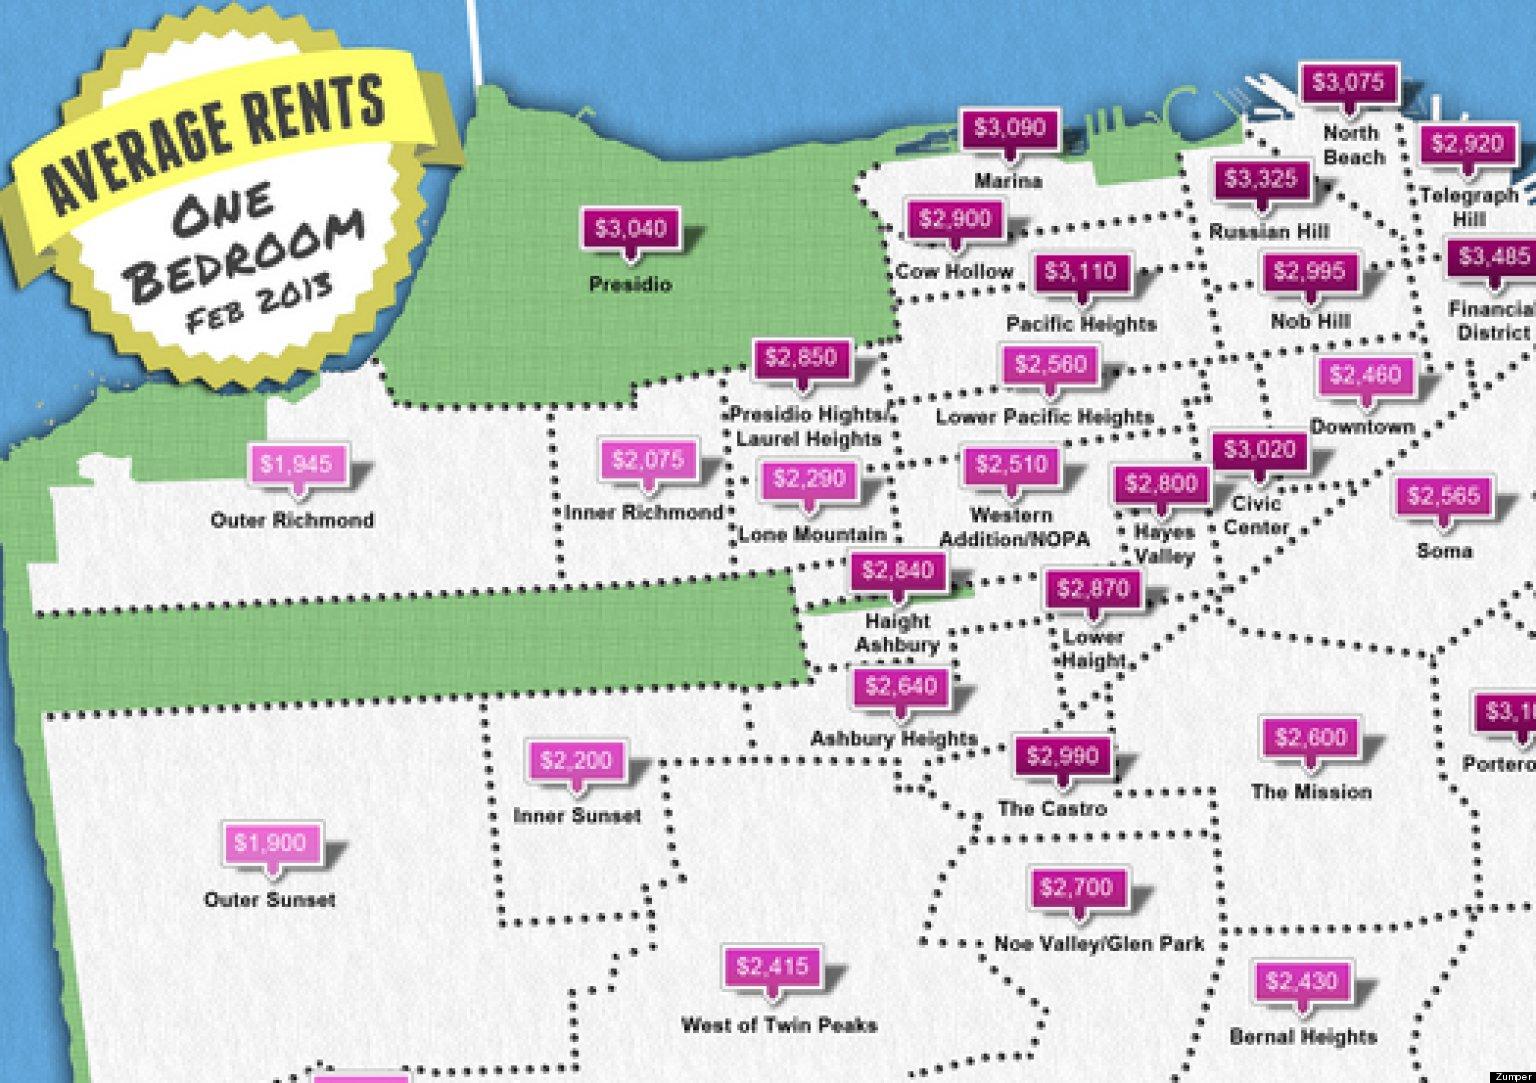 San Francisco Rental Rates Zumpercom Maps The Average One